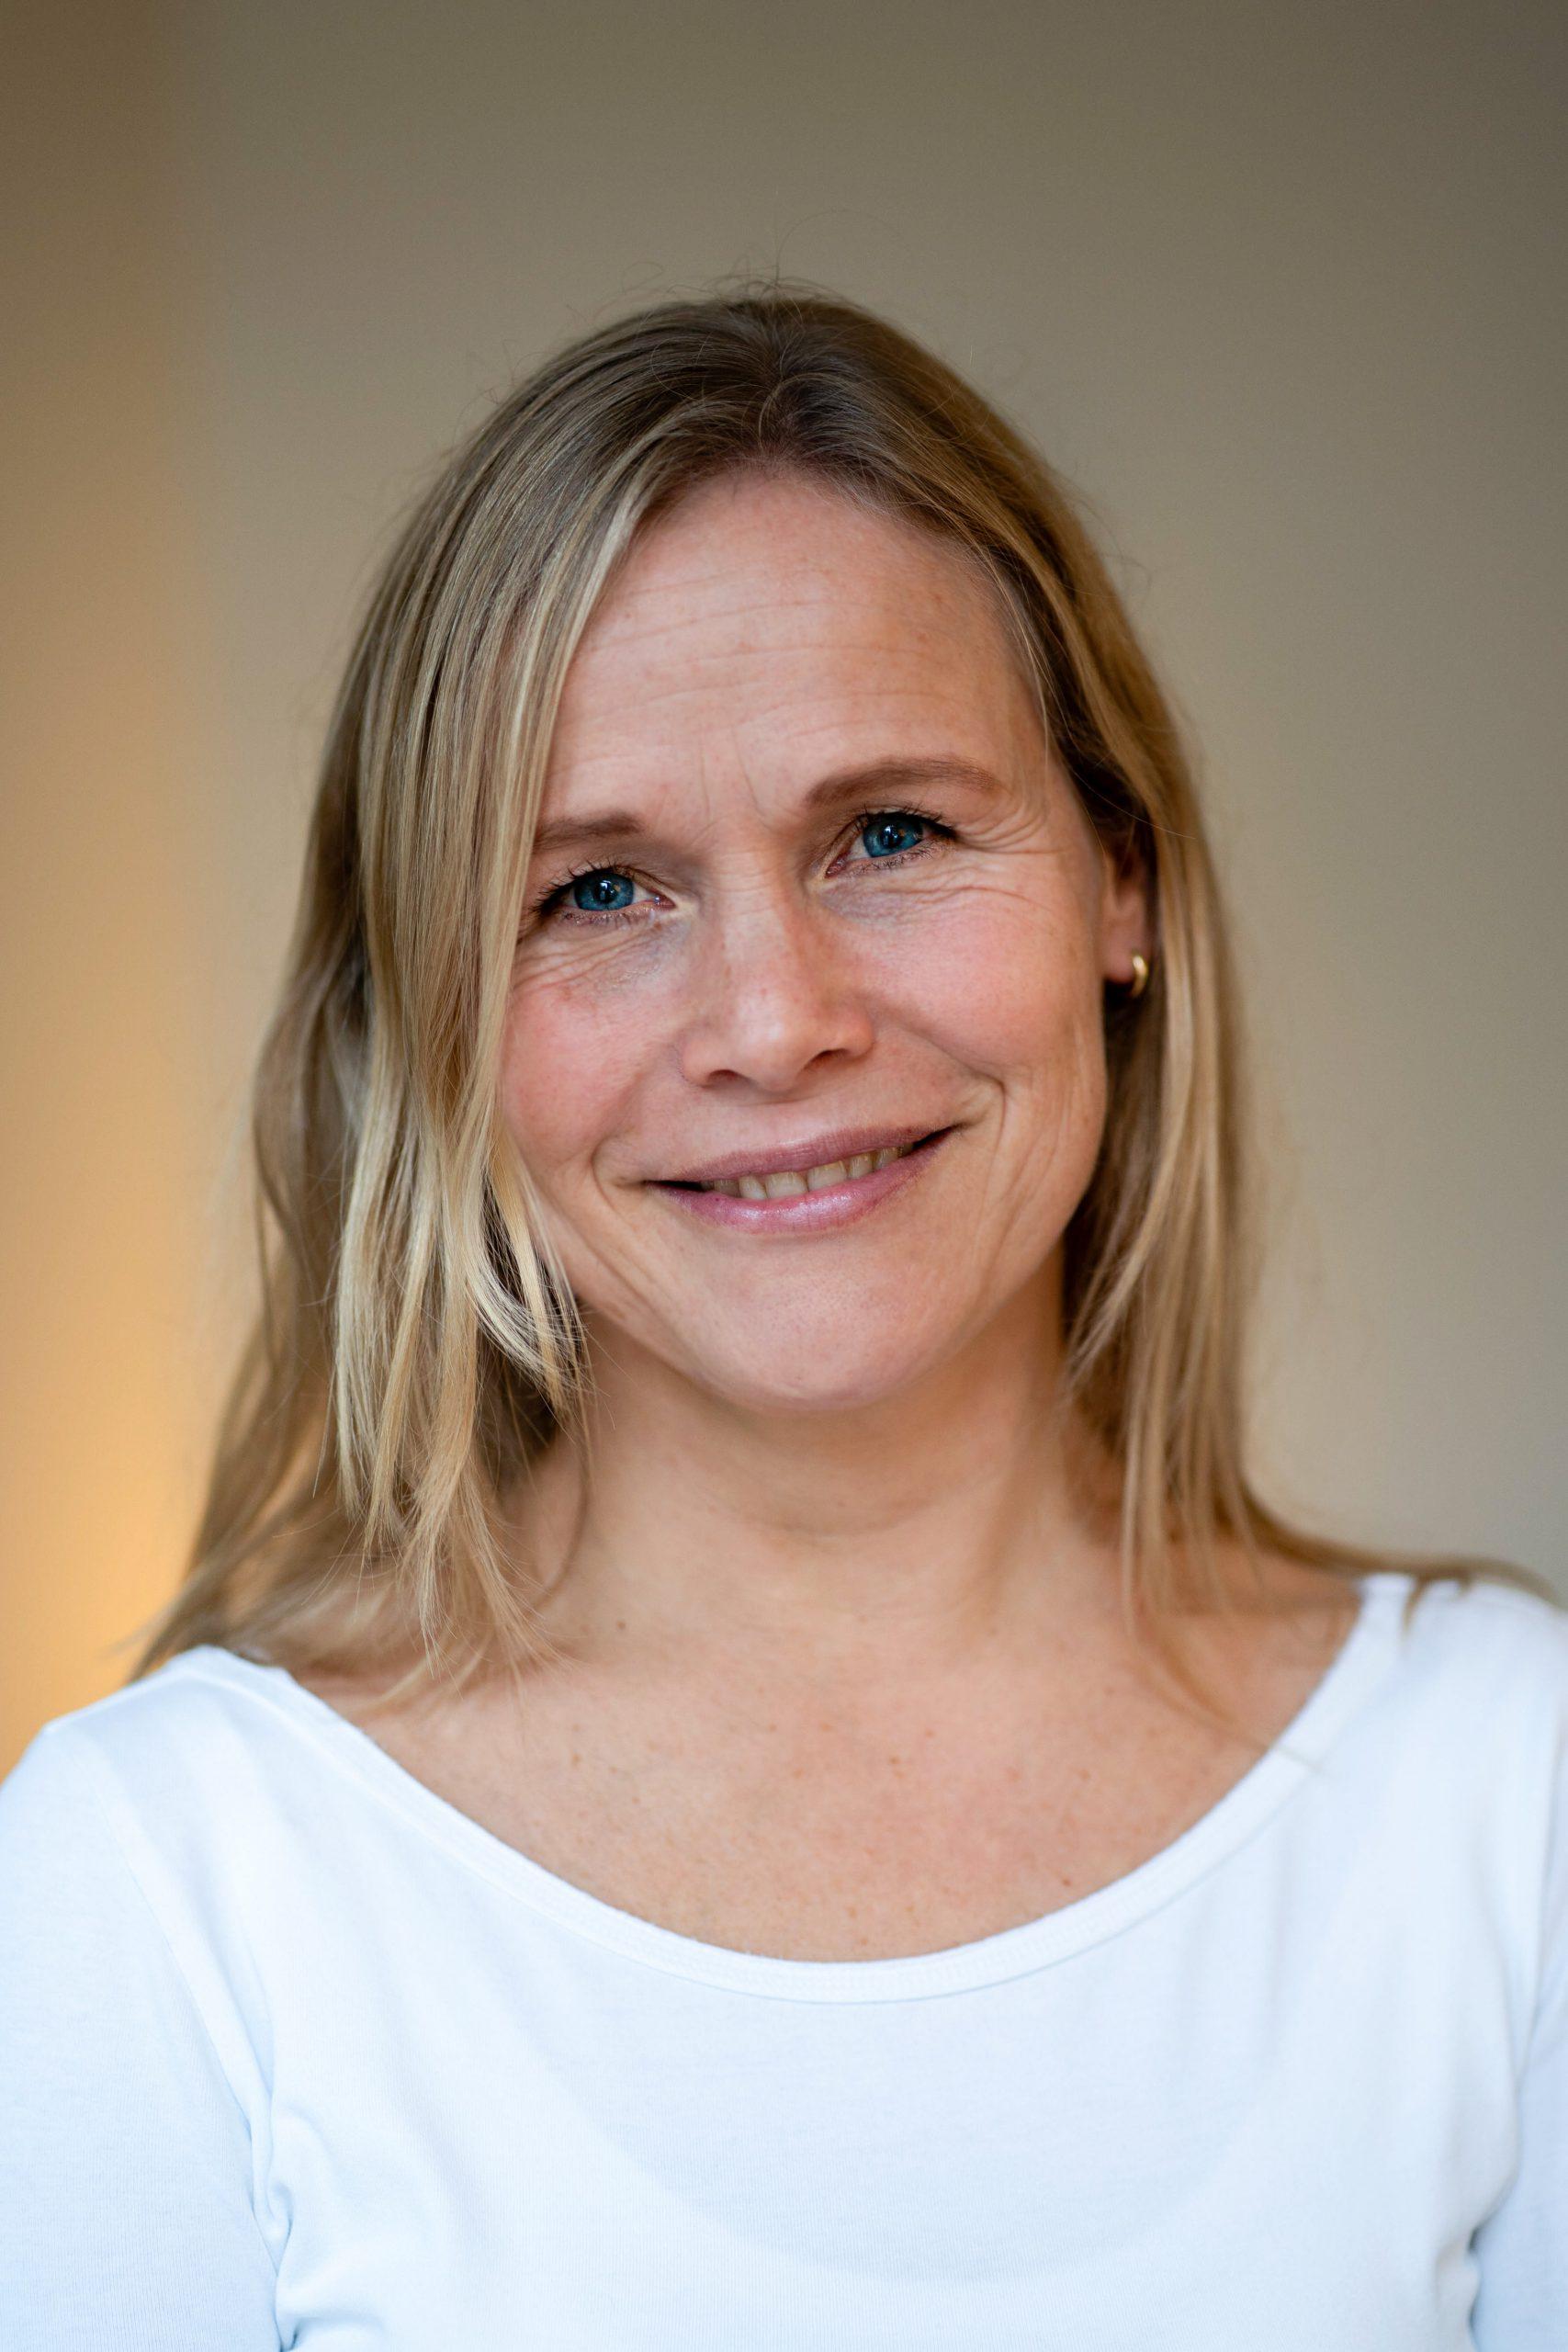 Wendy Jurgens